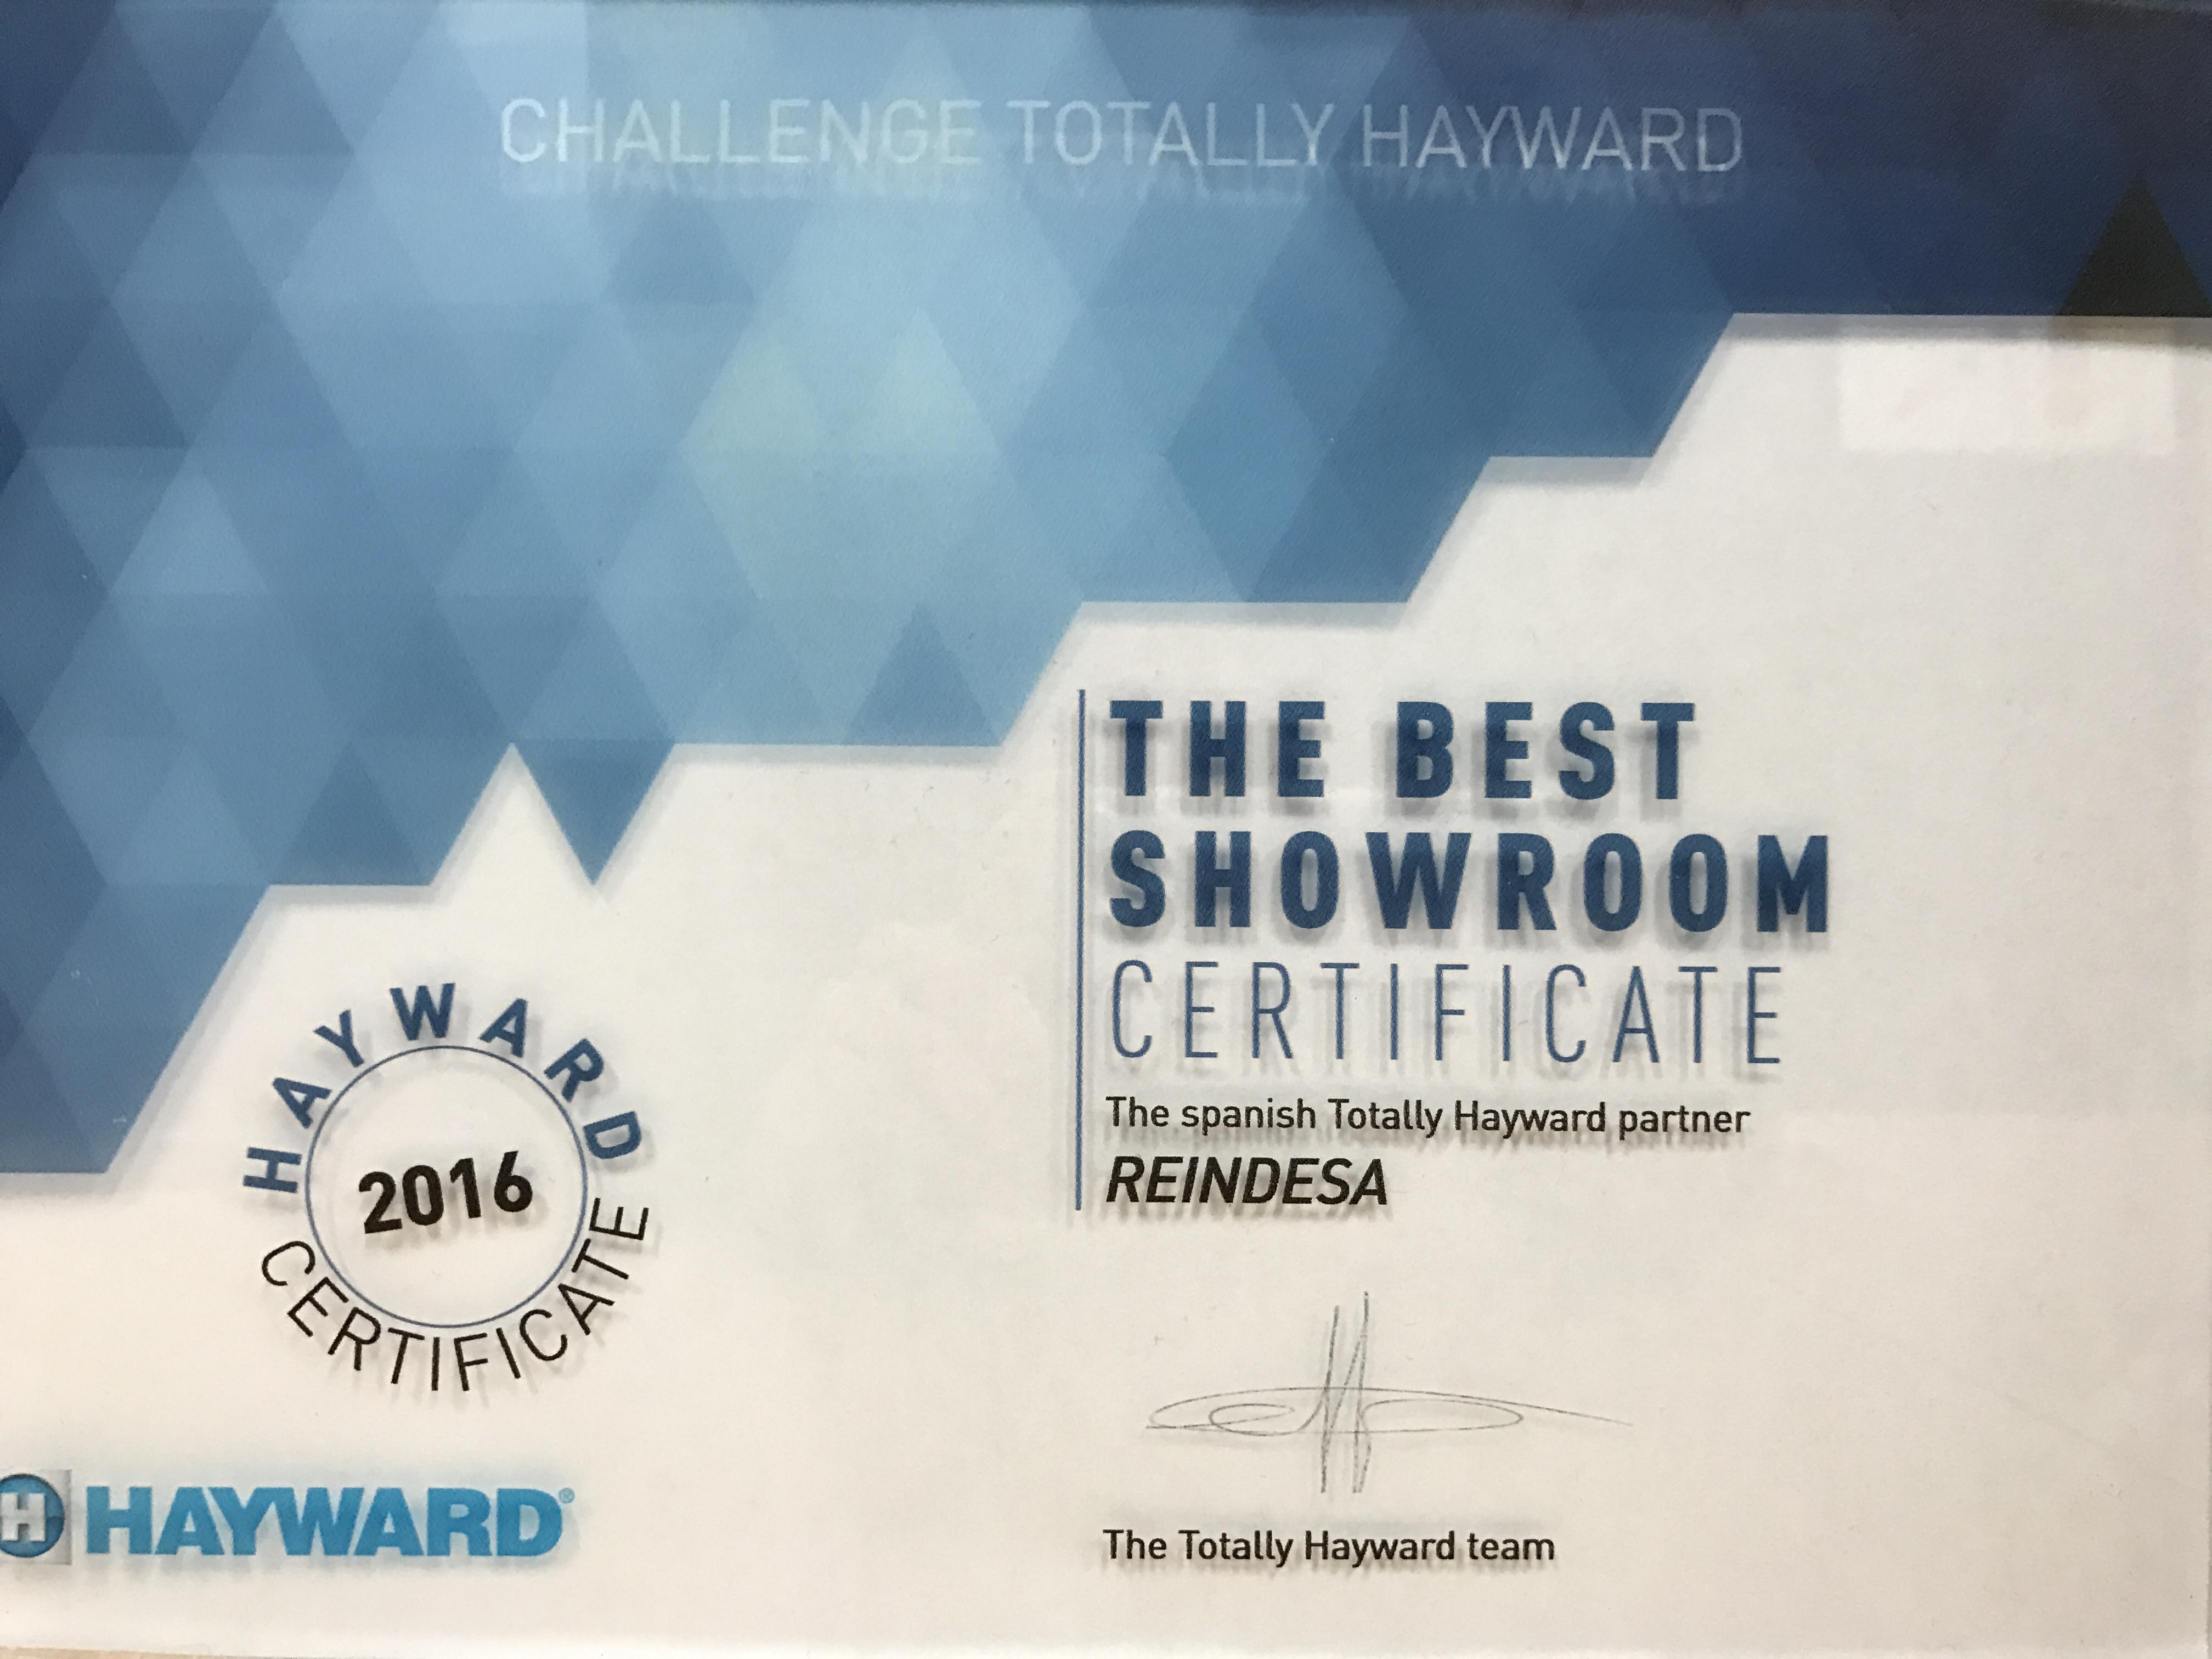 Premio Hayward - Reindesa Vilassar de Mar